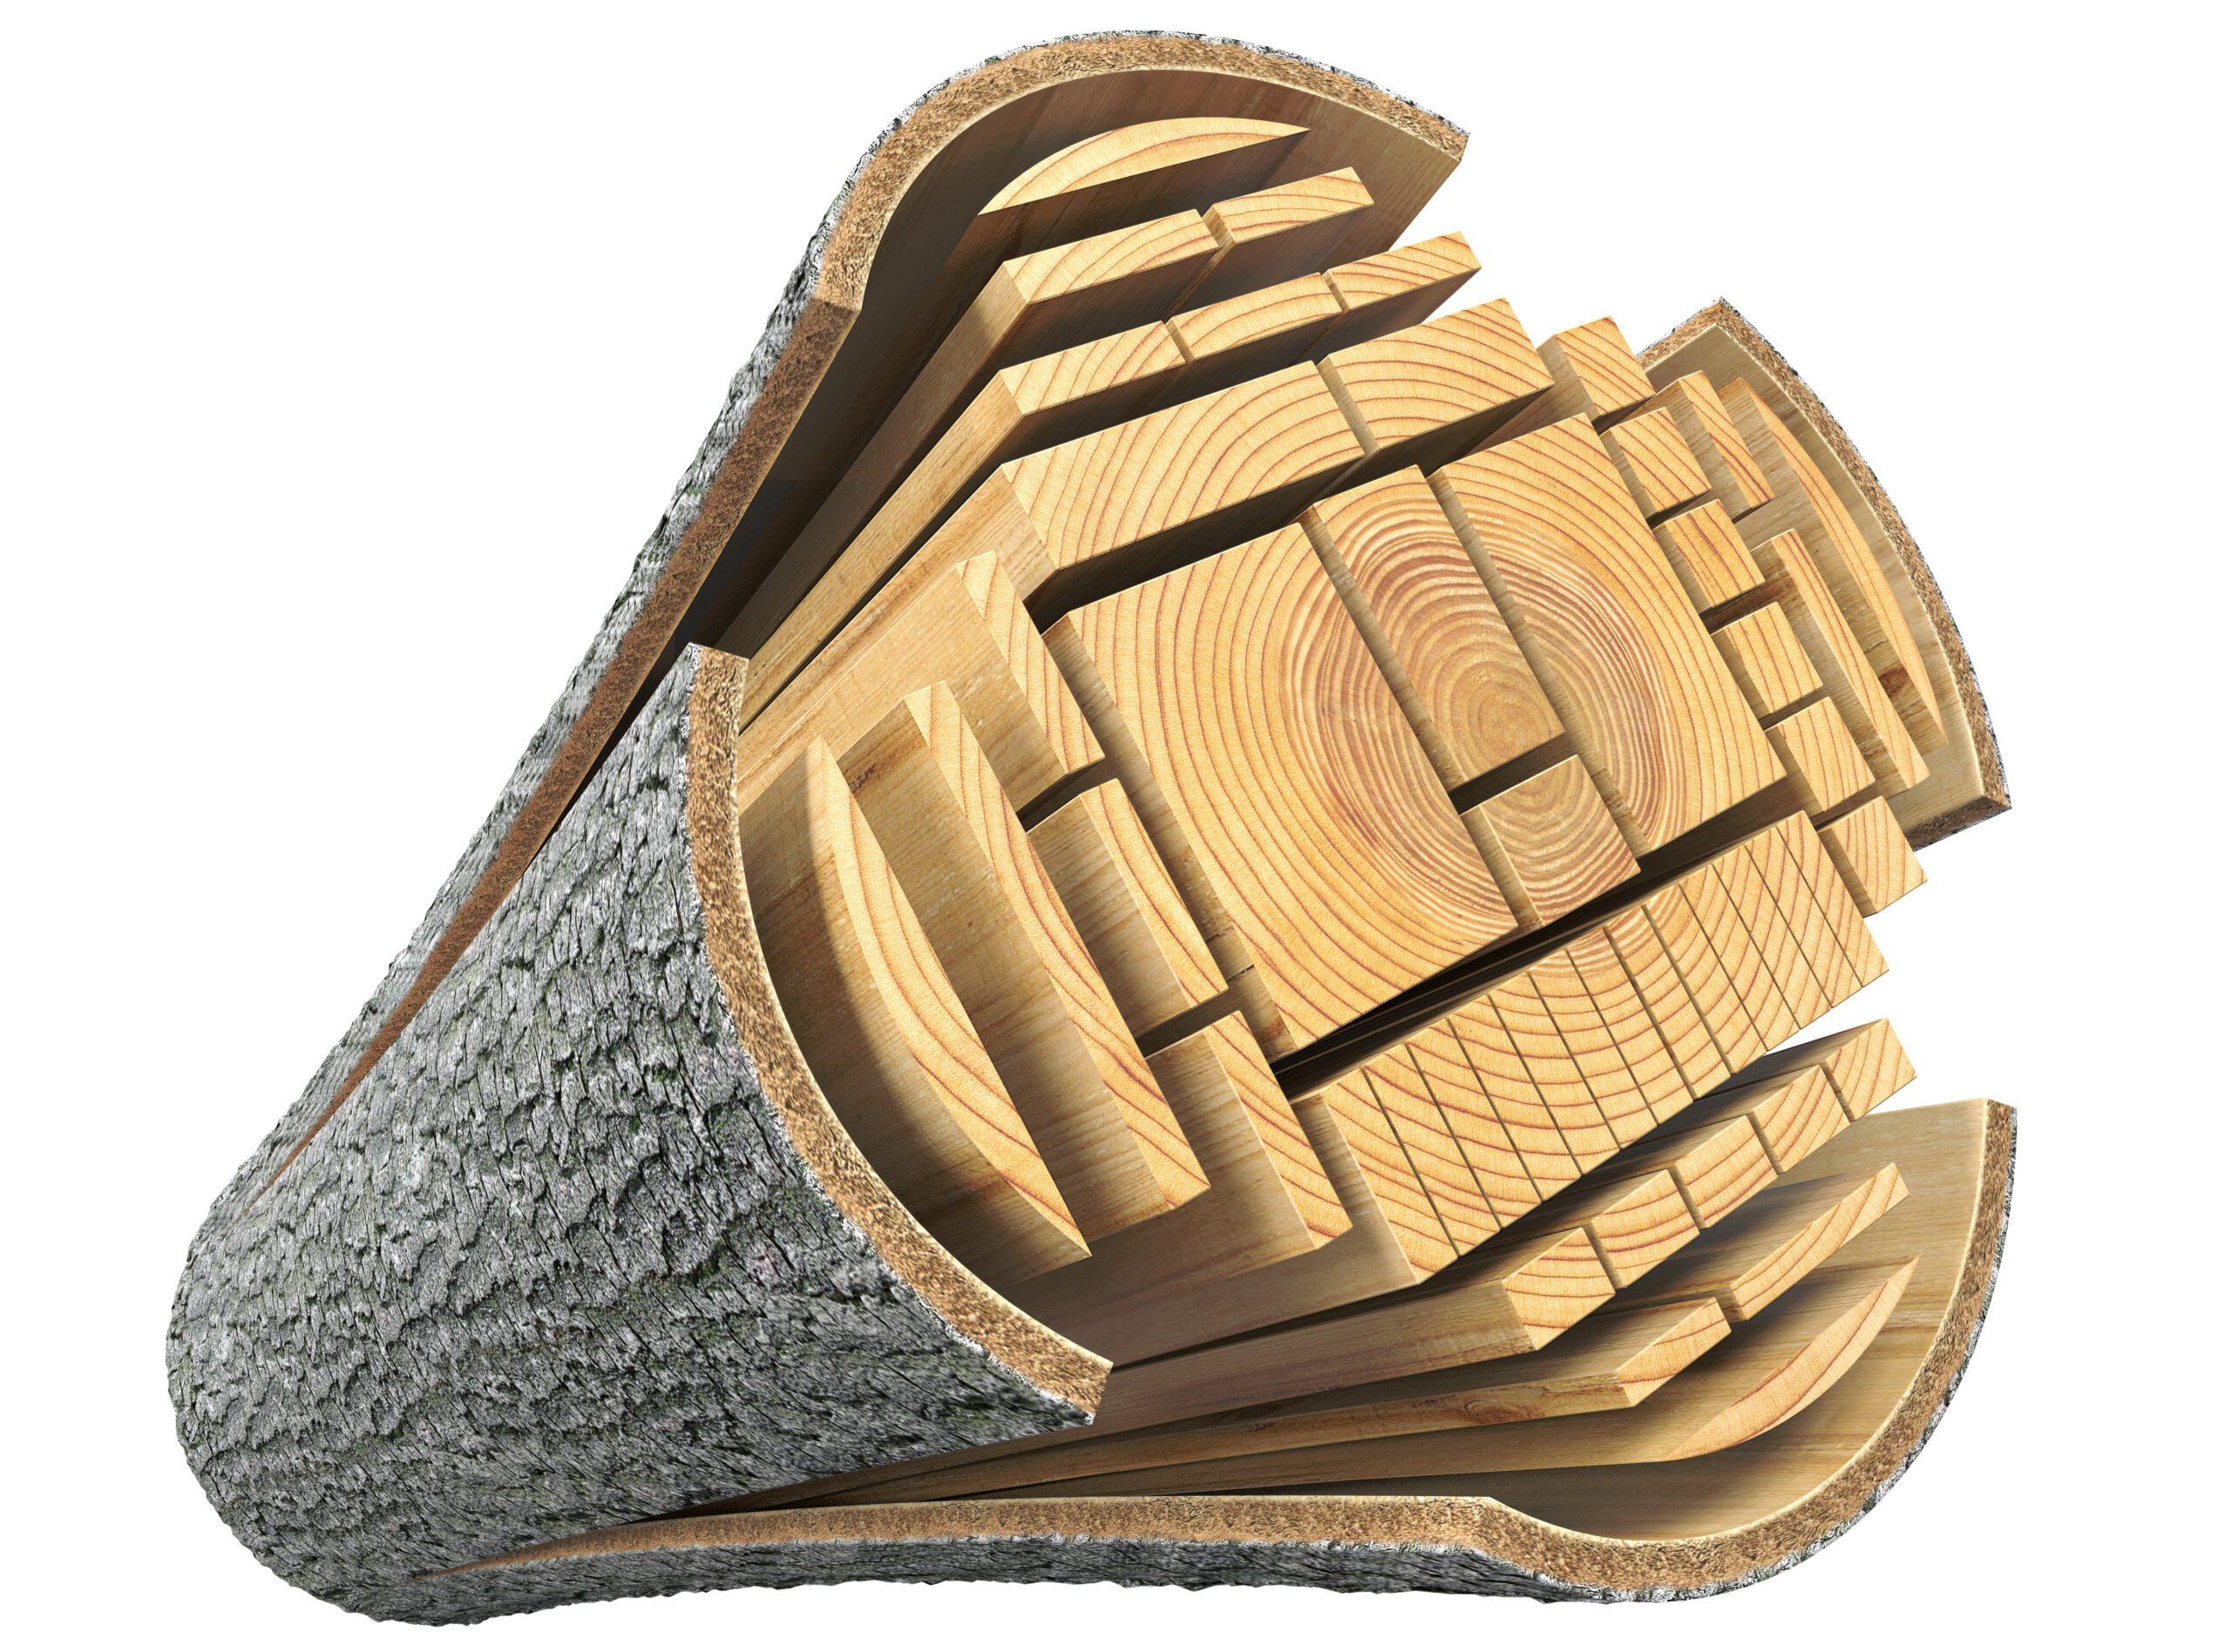 Cross-section of optimizing raw log into construction wood using laser based optimization